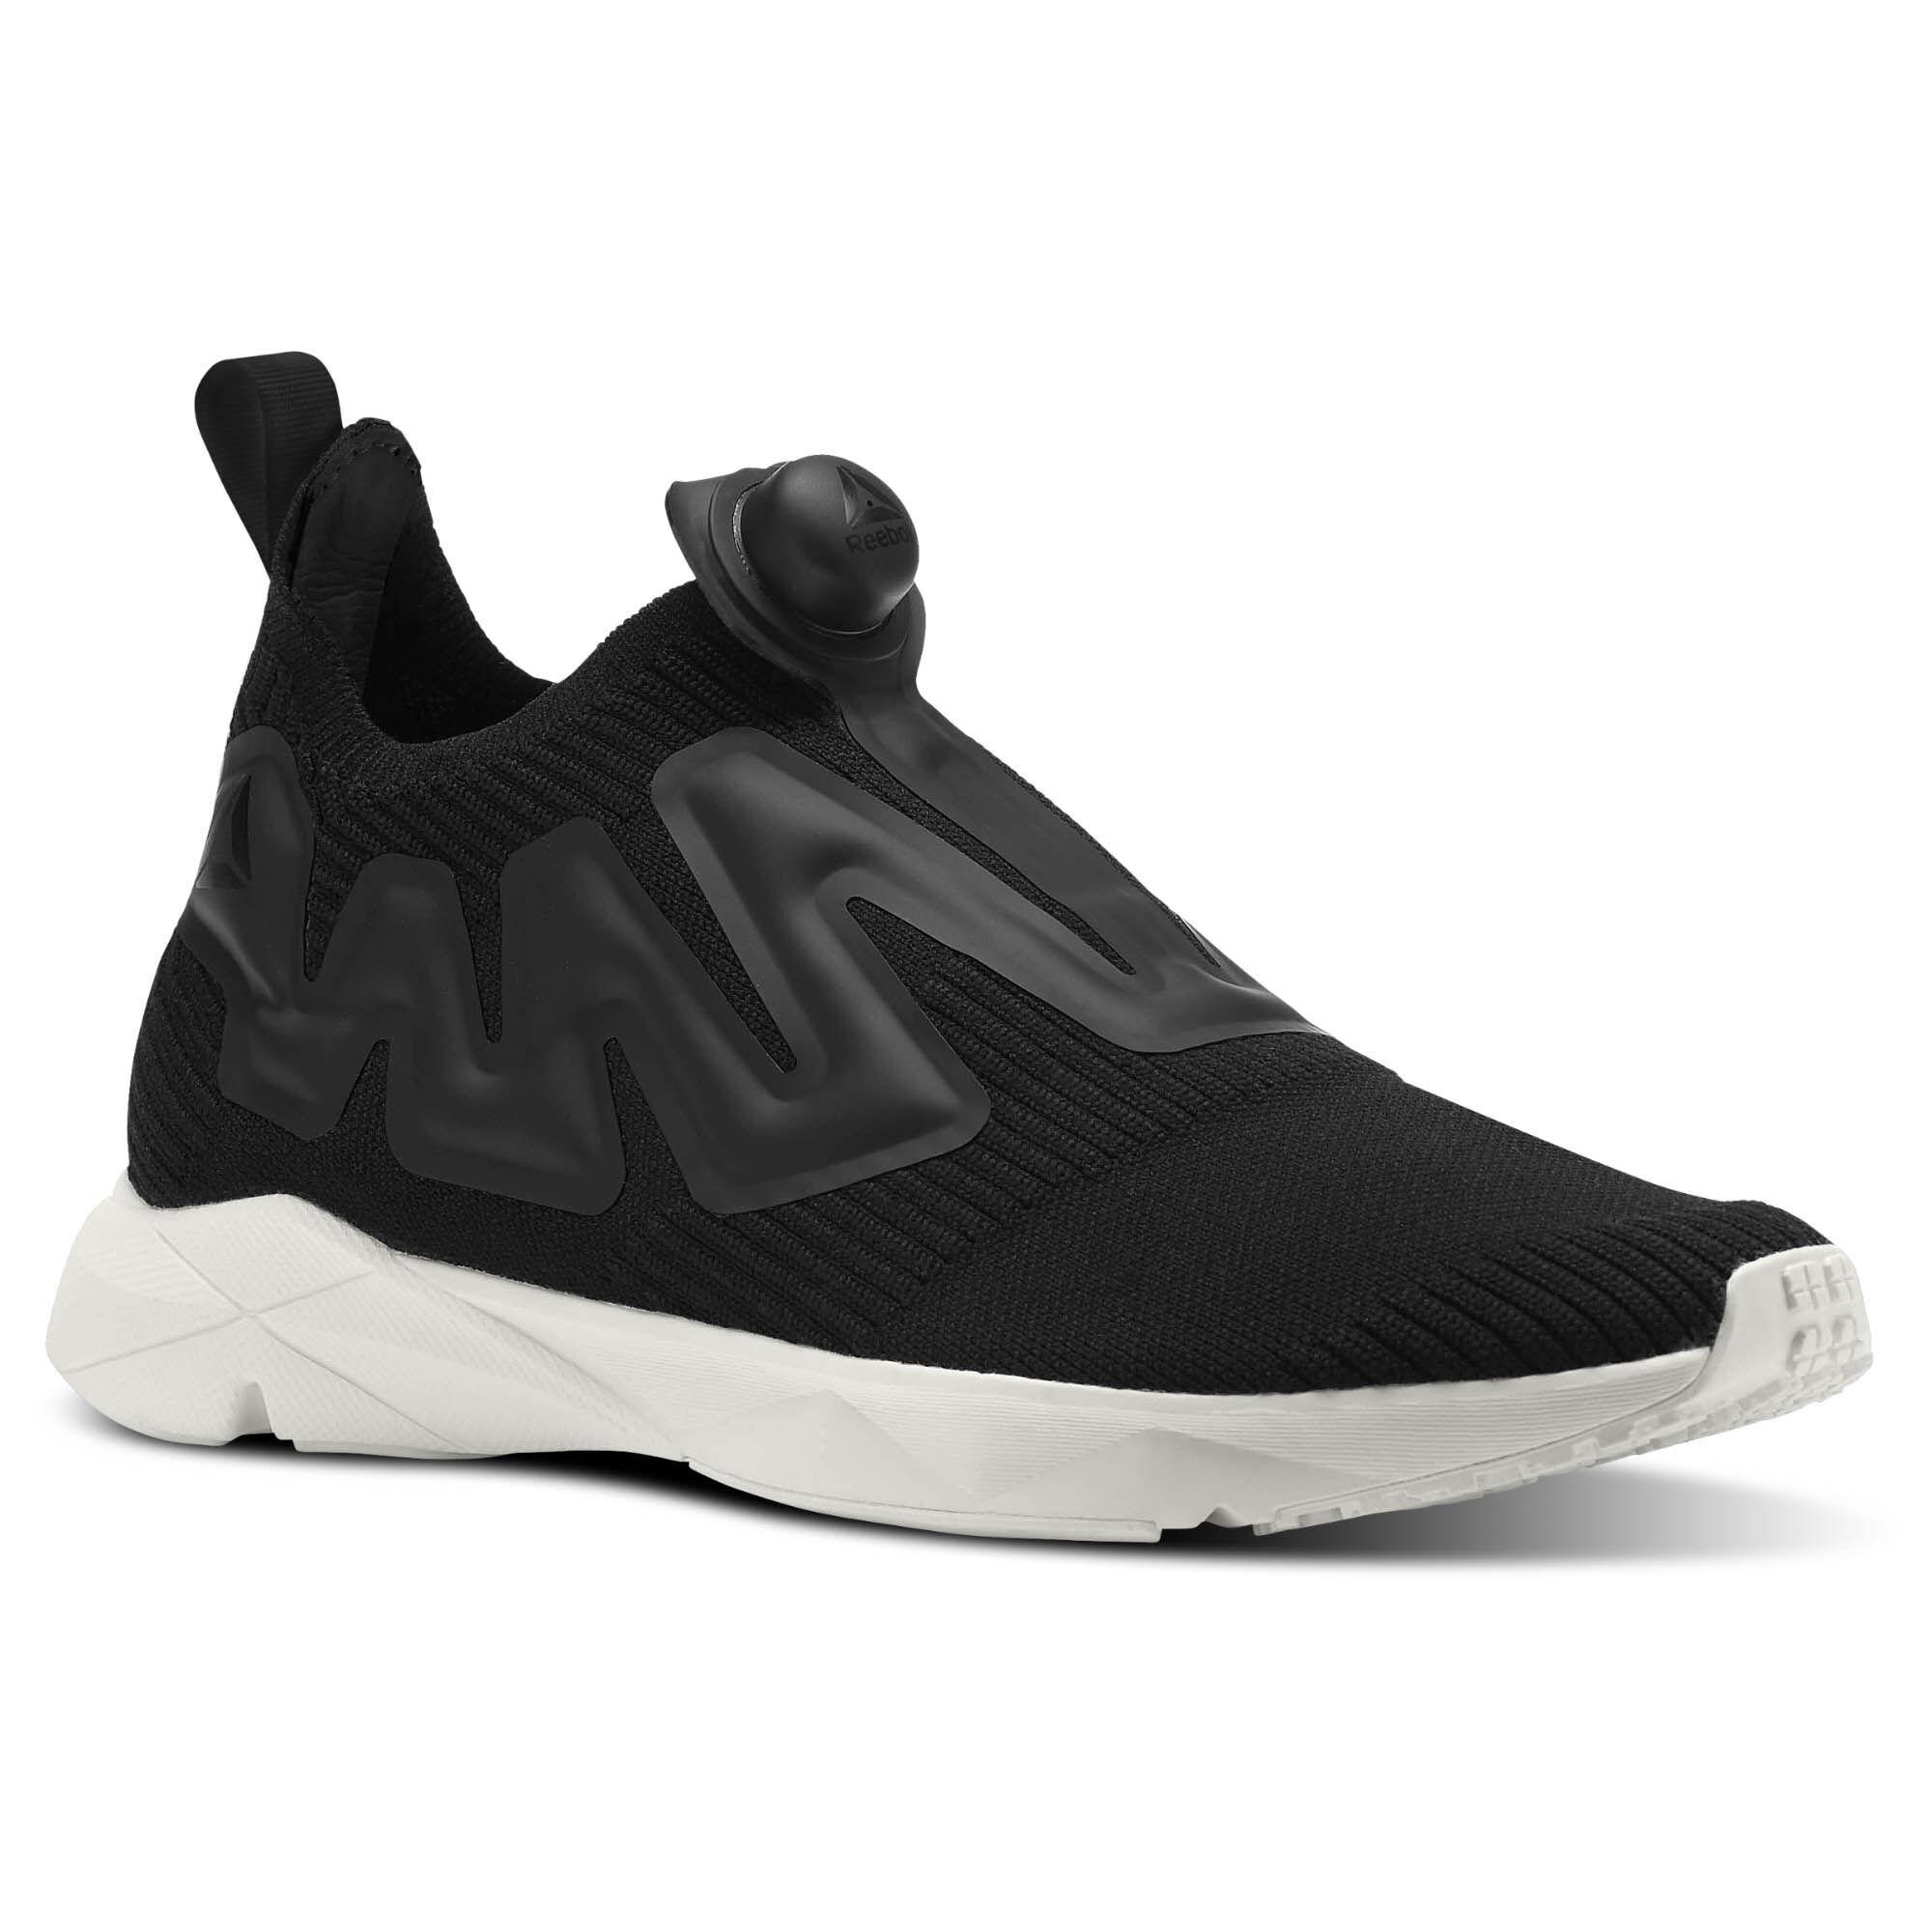 Reebok Sneakers Suprêmes - Noir Id1rYC